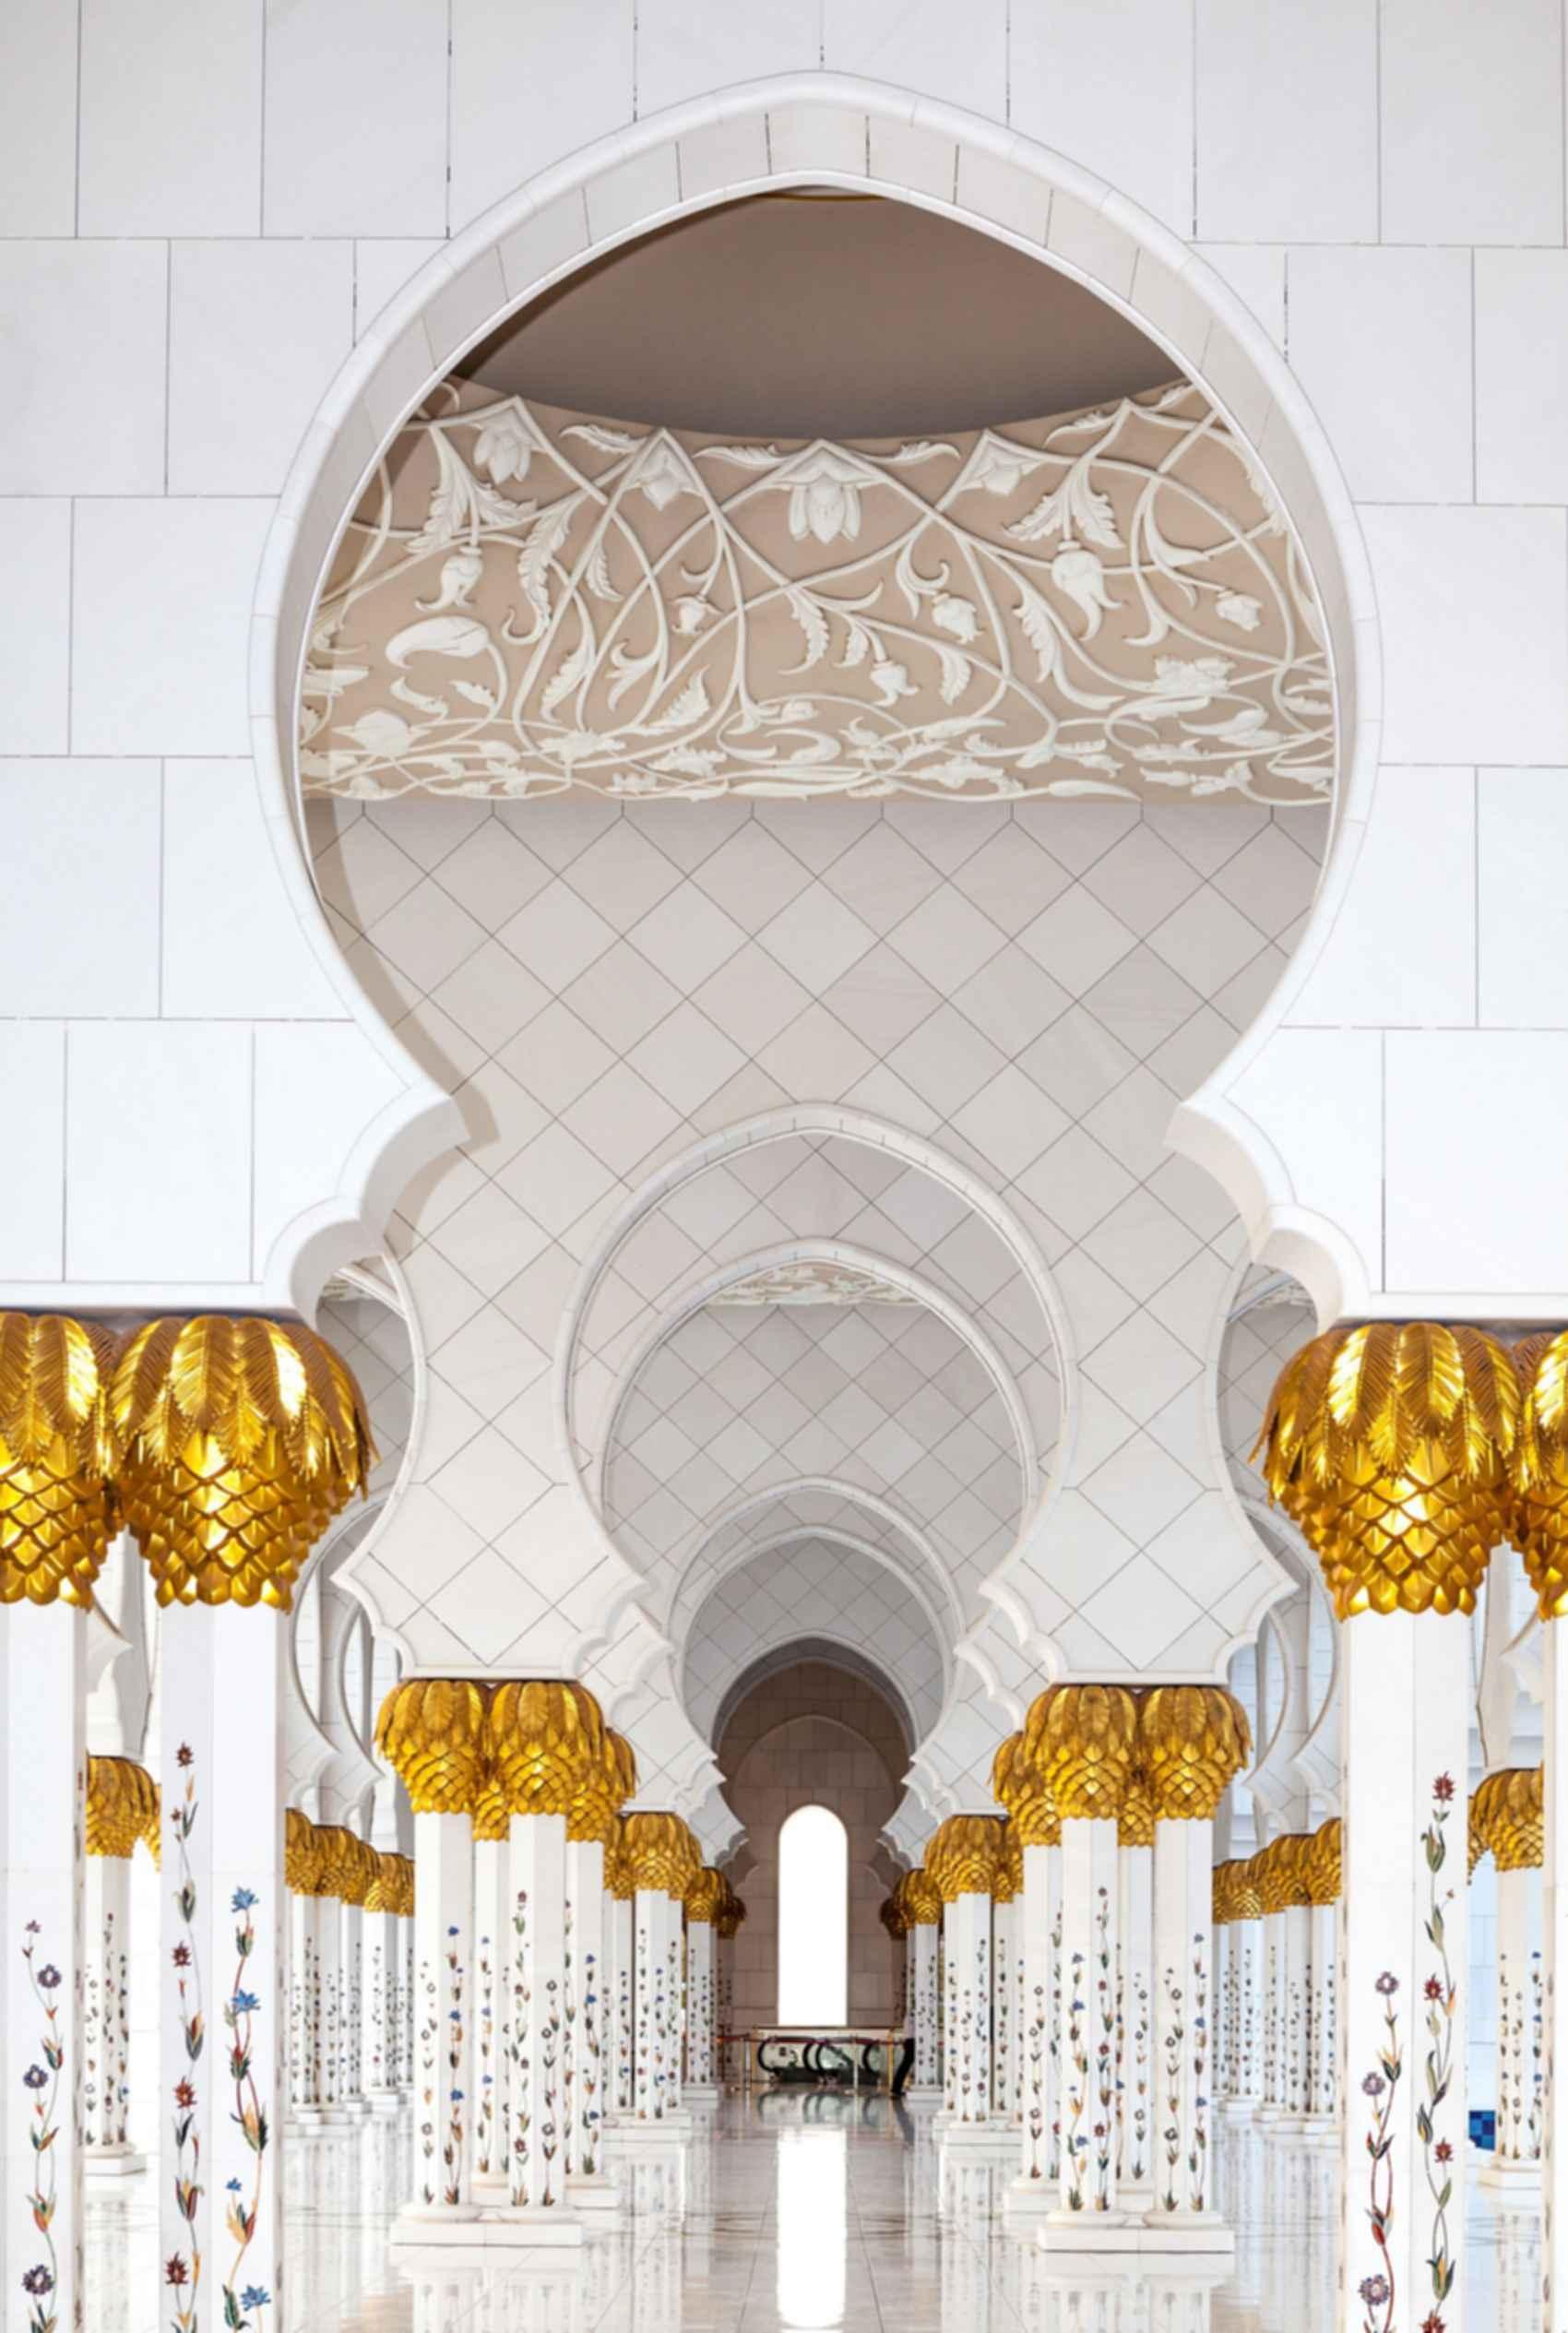 Sheikh Zayed Grand Mosque - Archway